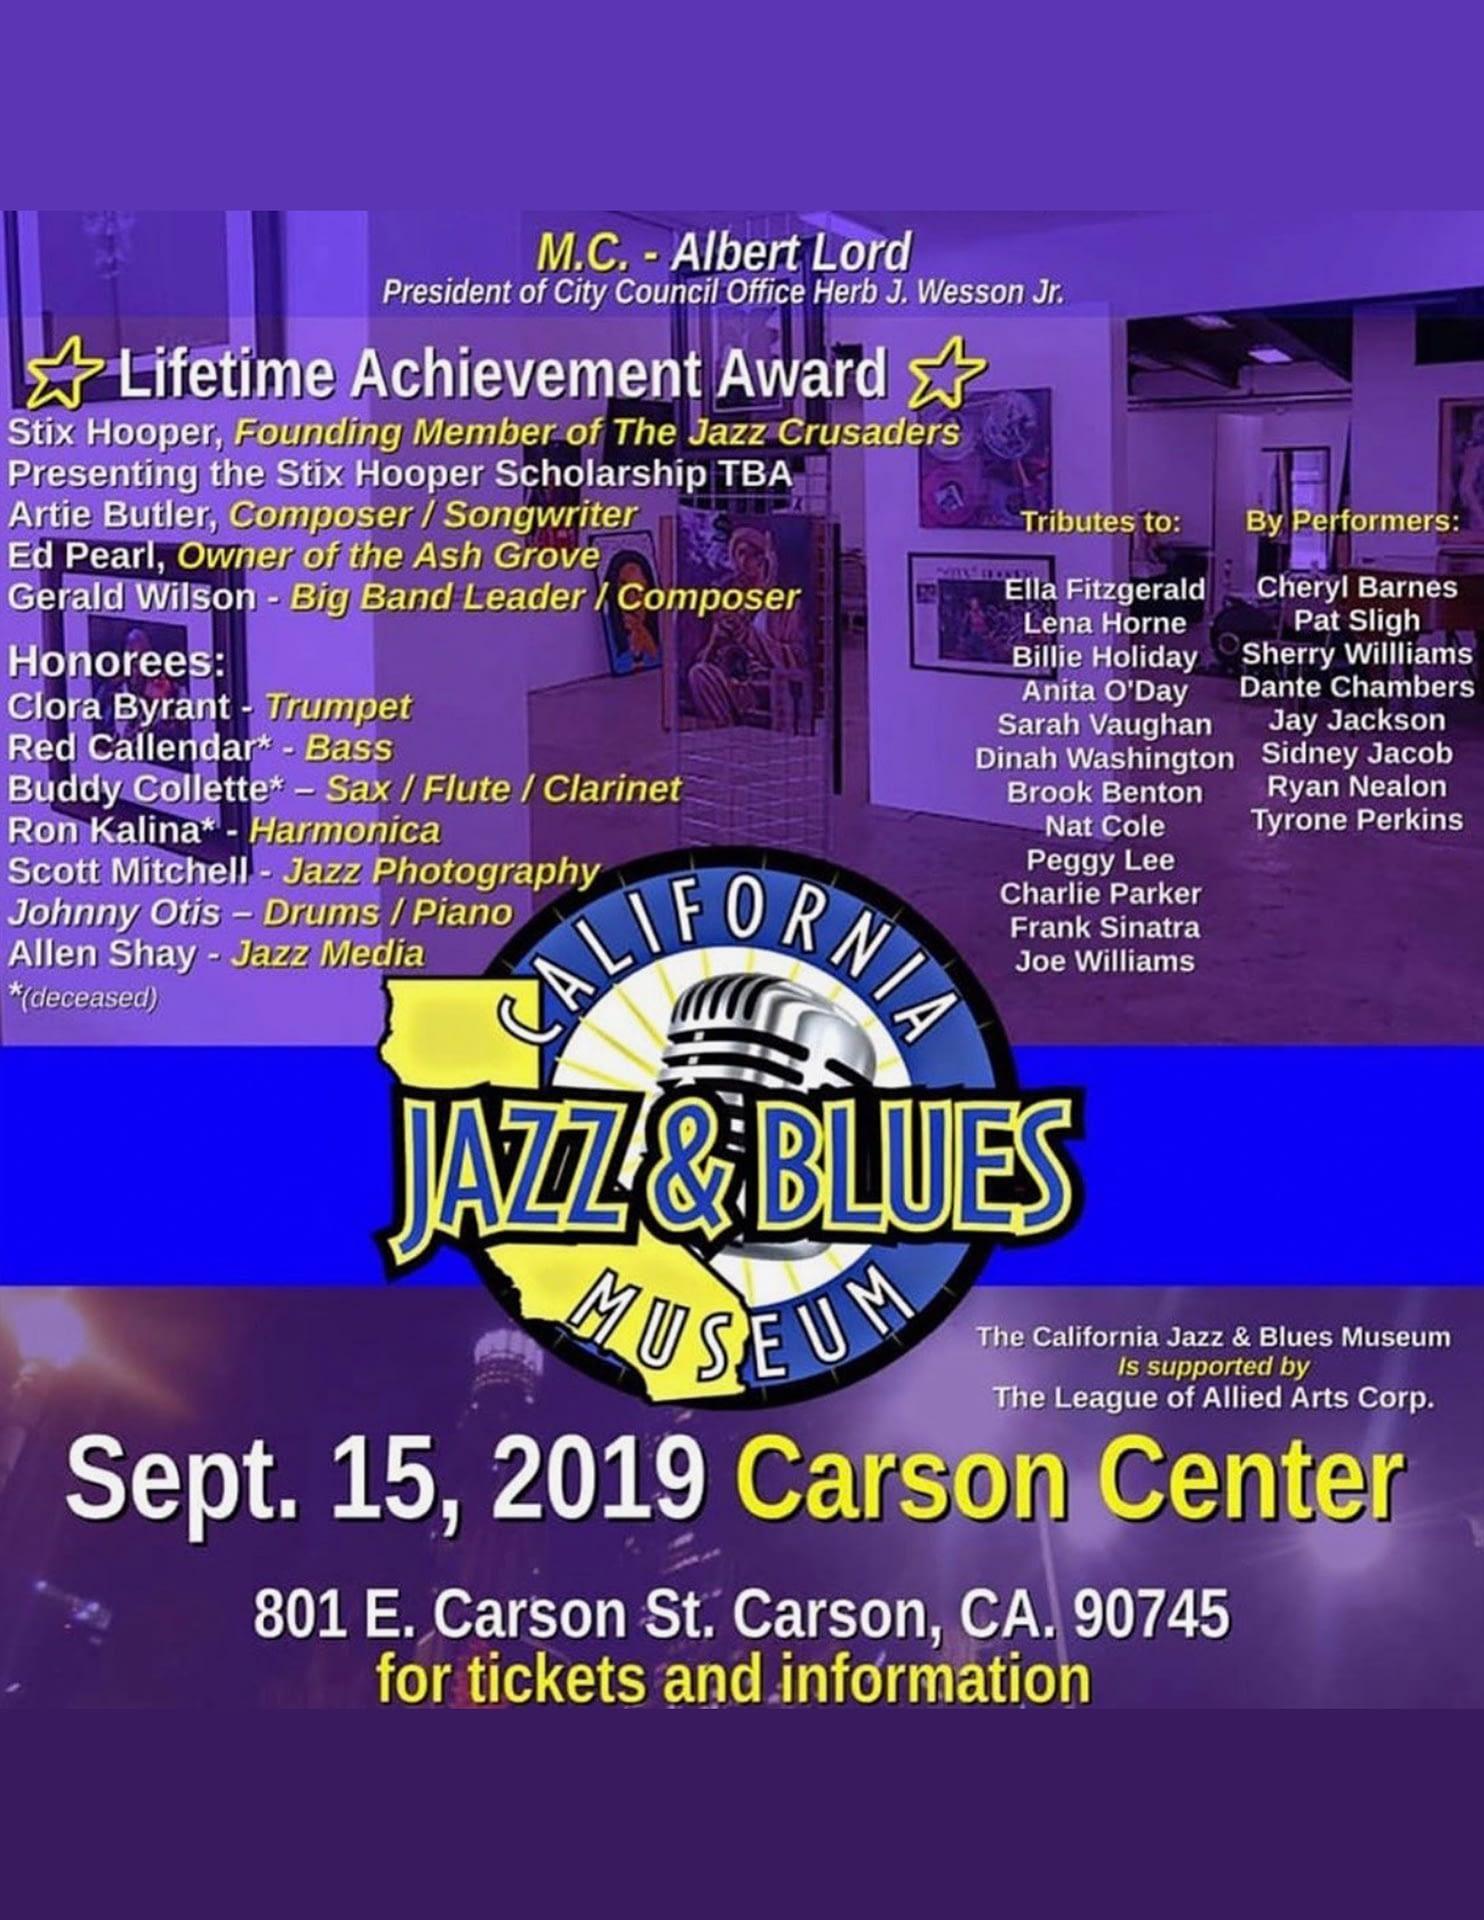 California Jazz & Blues Museum